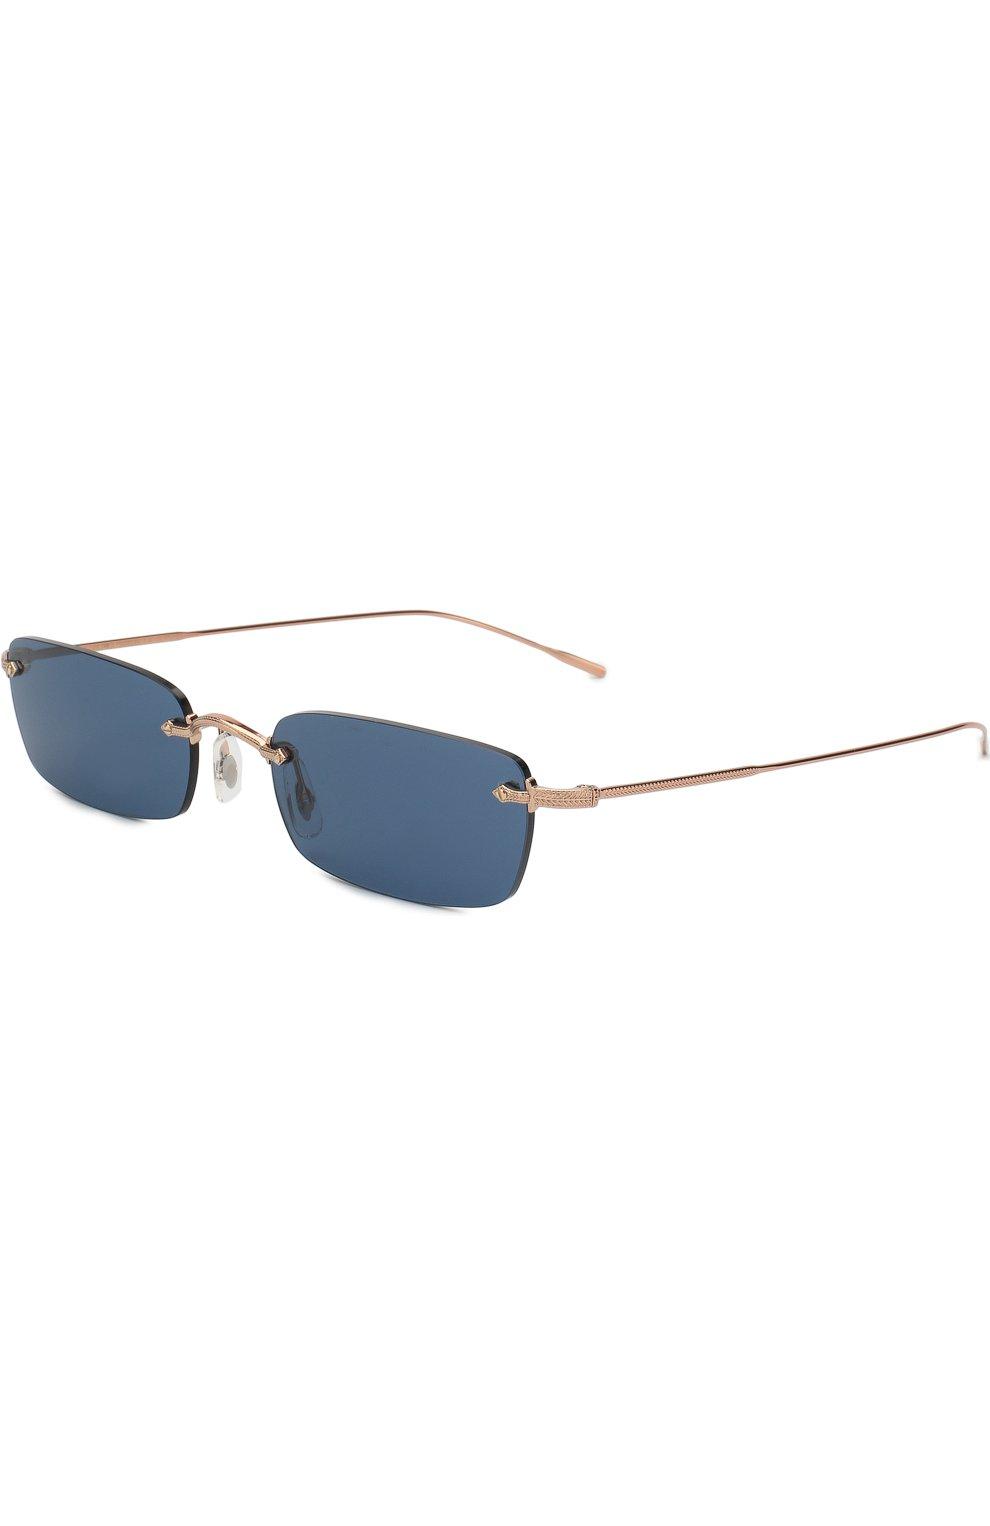 Женские солнцезащитные очки OLIVER PEOPLES темно-синего цвета, арт. 1243S-503780 | Фото 1